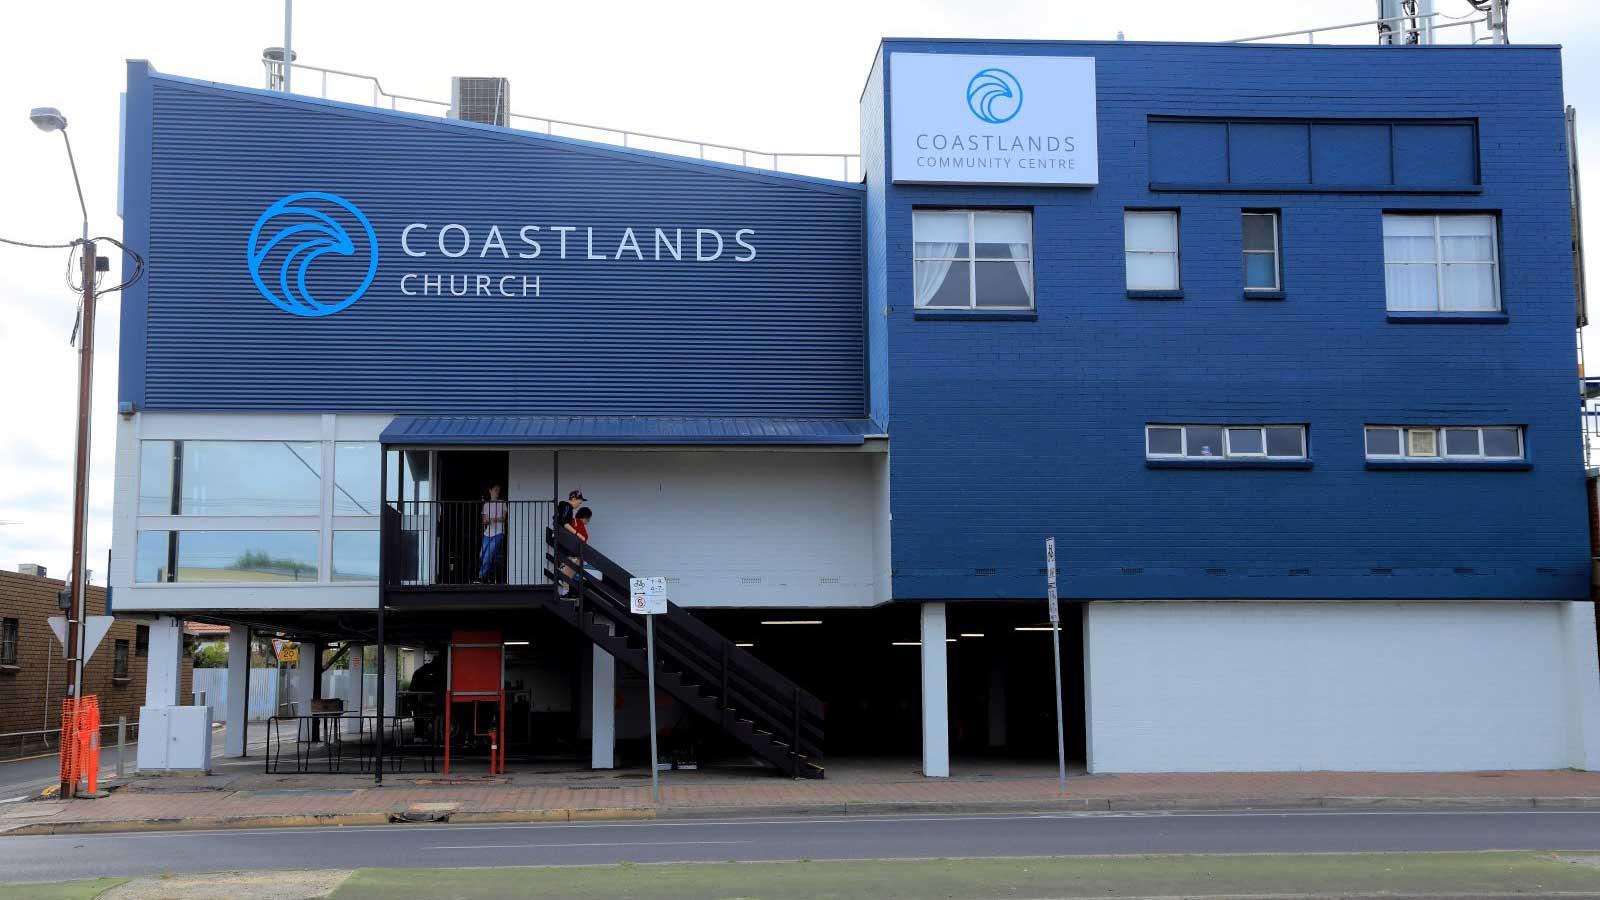 Coastlands Church Brighton South Australia | 528-530 Brighton Rd, Brighton SA 5048